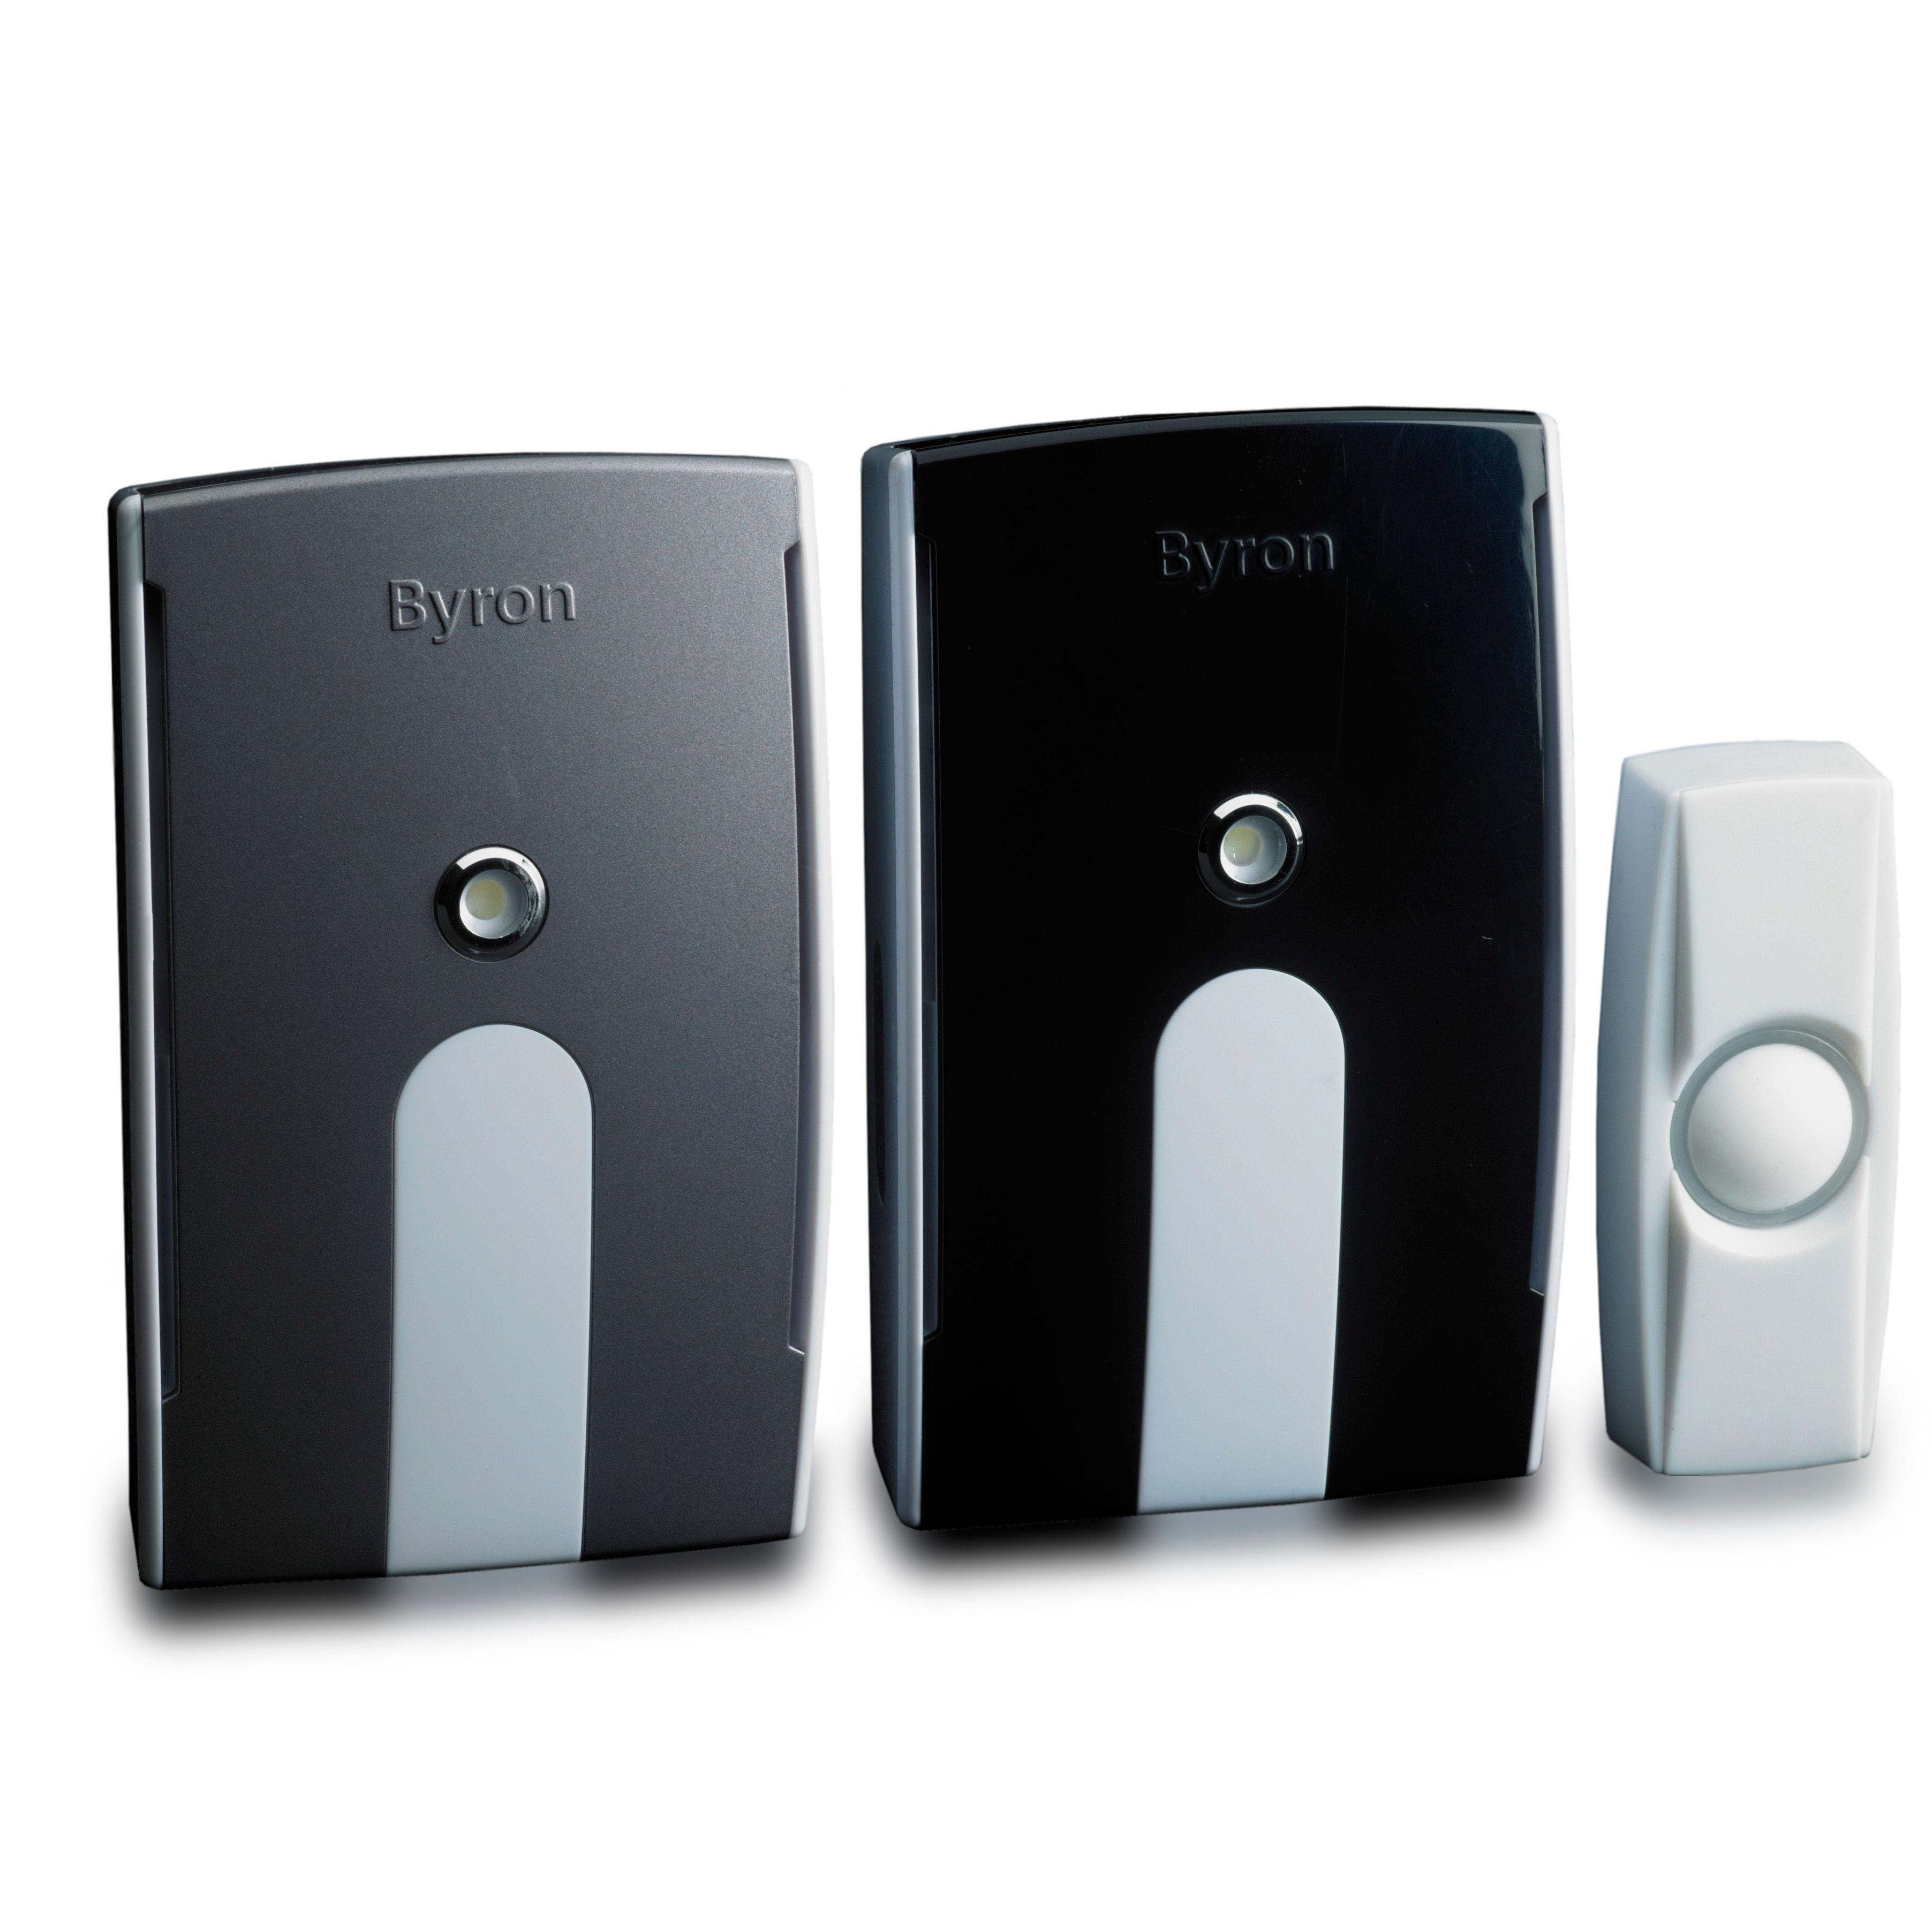 Byron Wirefree White Portable u0026 Plug-In Door Chime | Departments | DIY at Bu0026Q  sc 1 st  Bu0026Q & Byron Wirefree White Portable u0026 Plug-In Door Chime | Departments ... pezcame.com